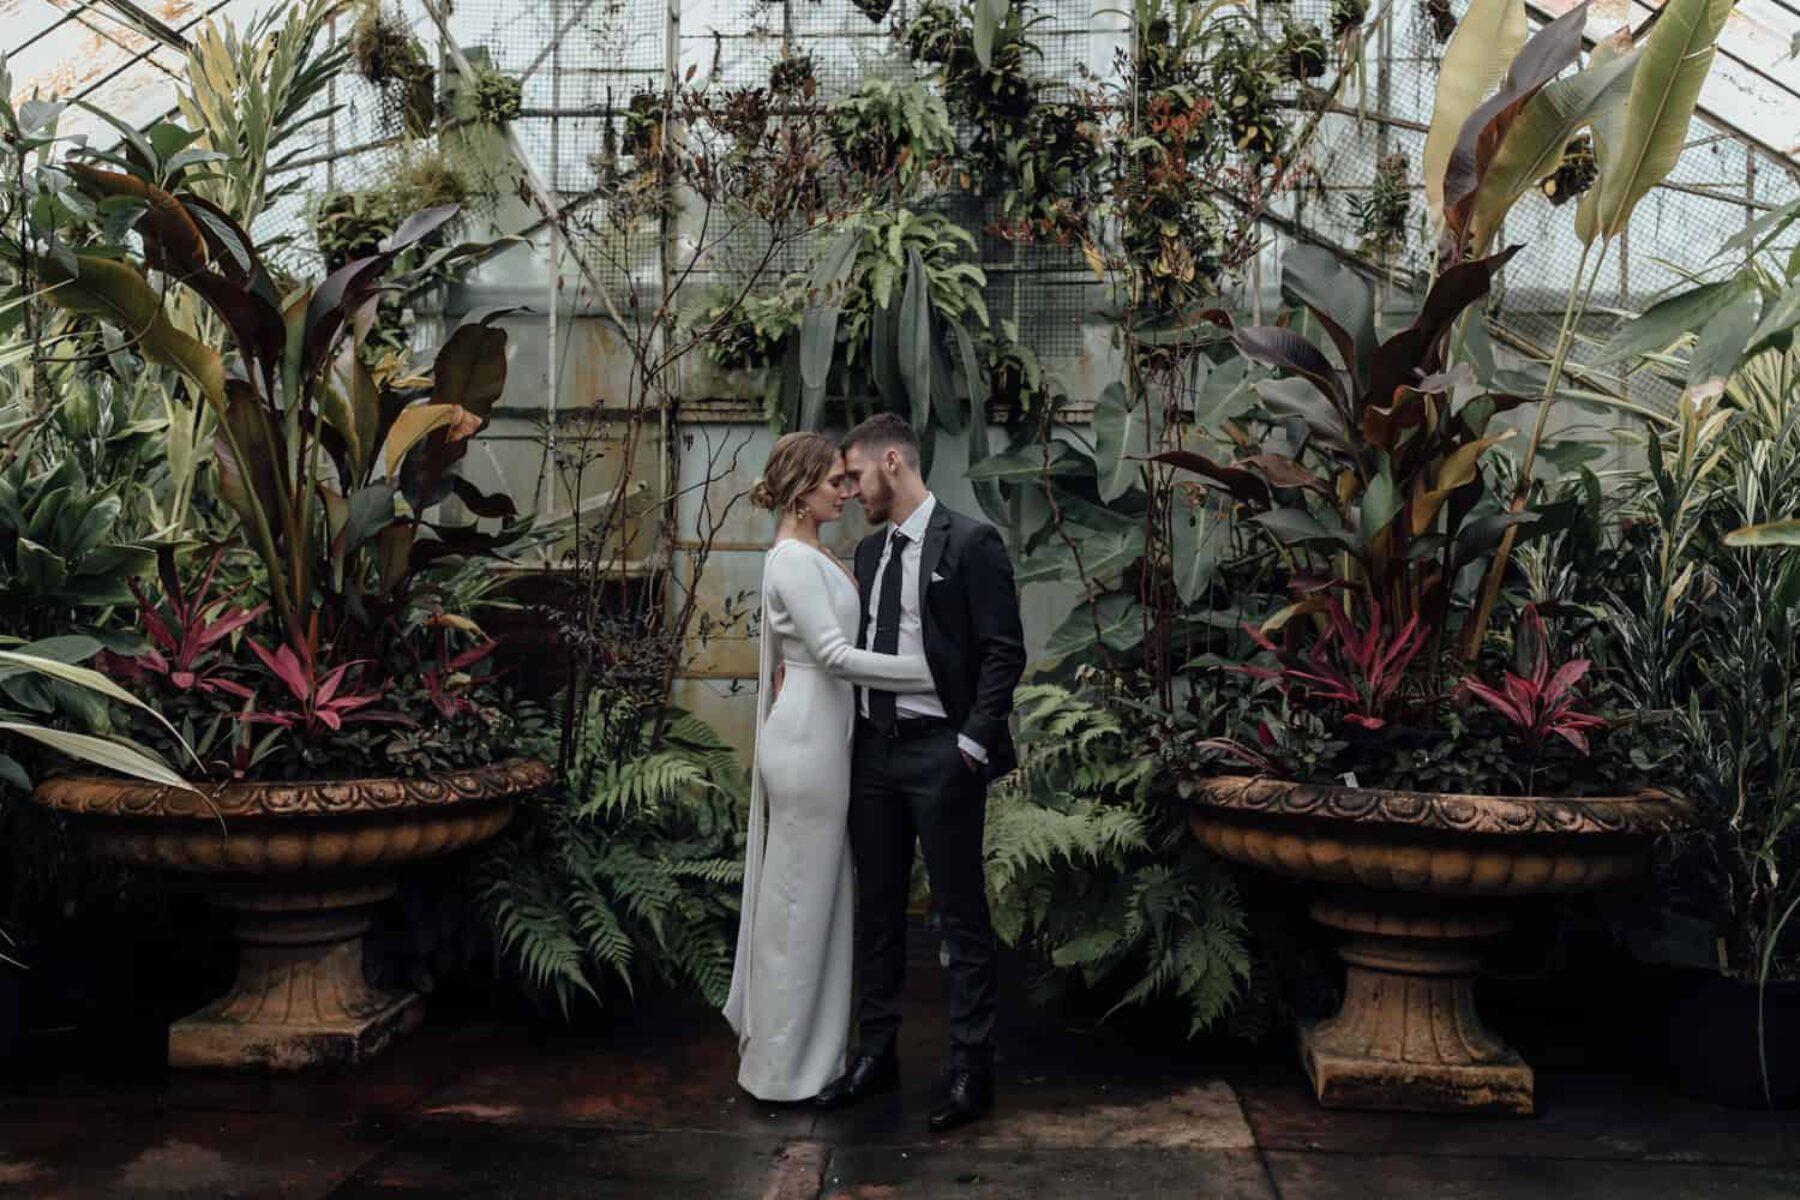 Melbourne glasshouse wedding - Jimmy Raper Photography